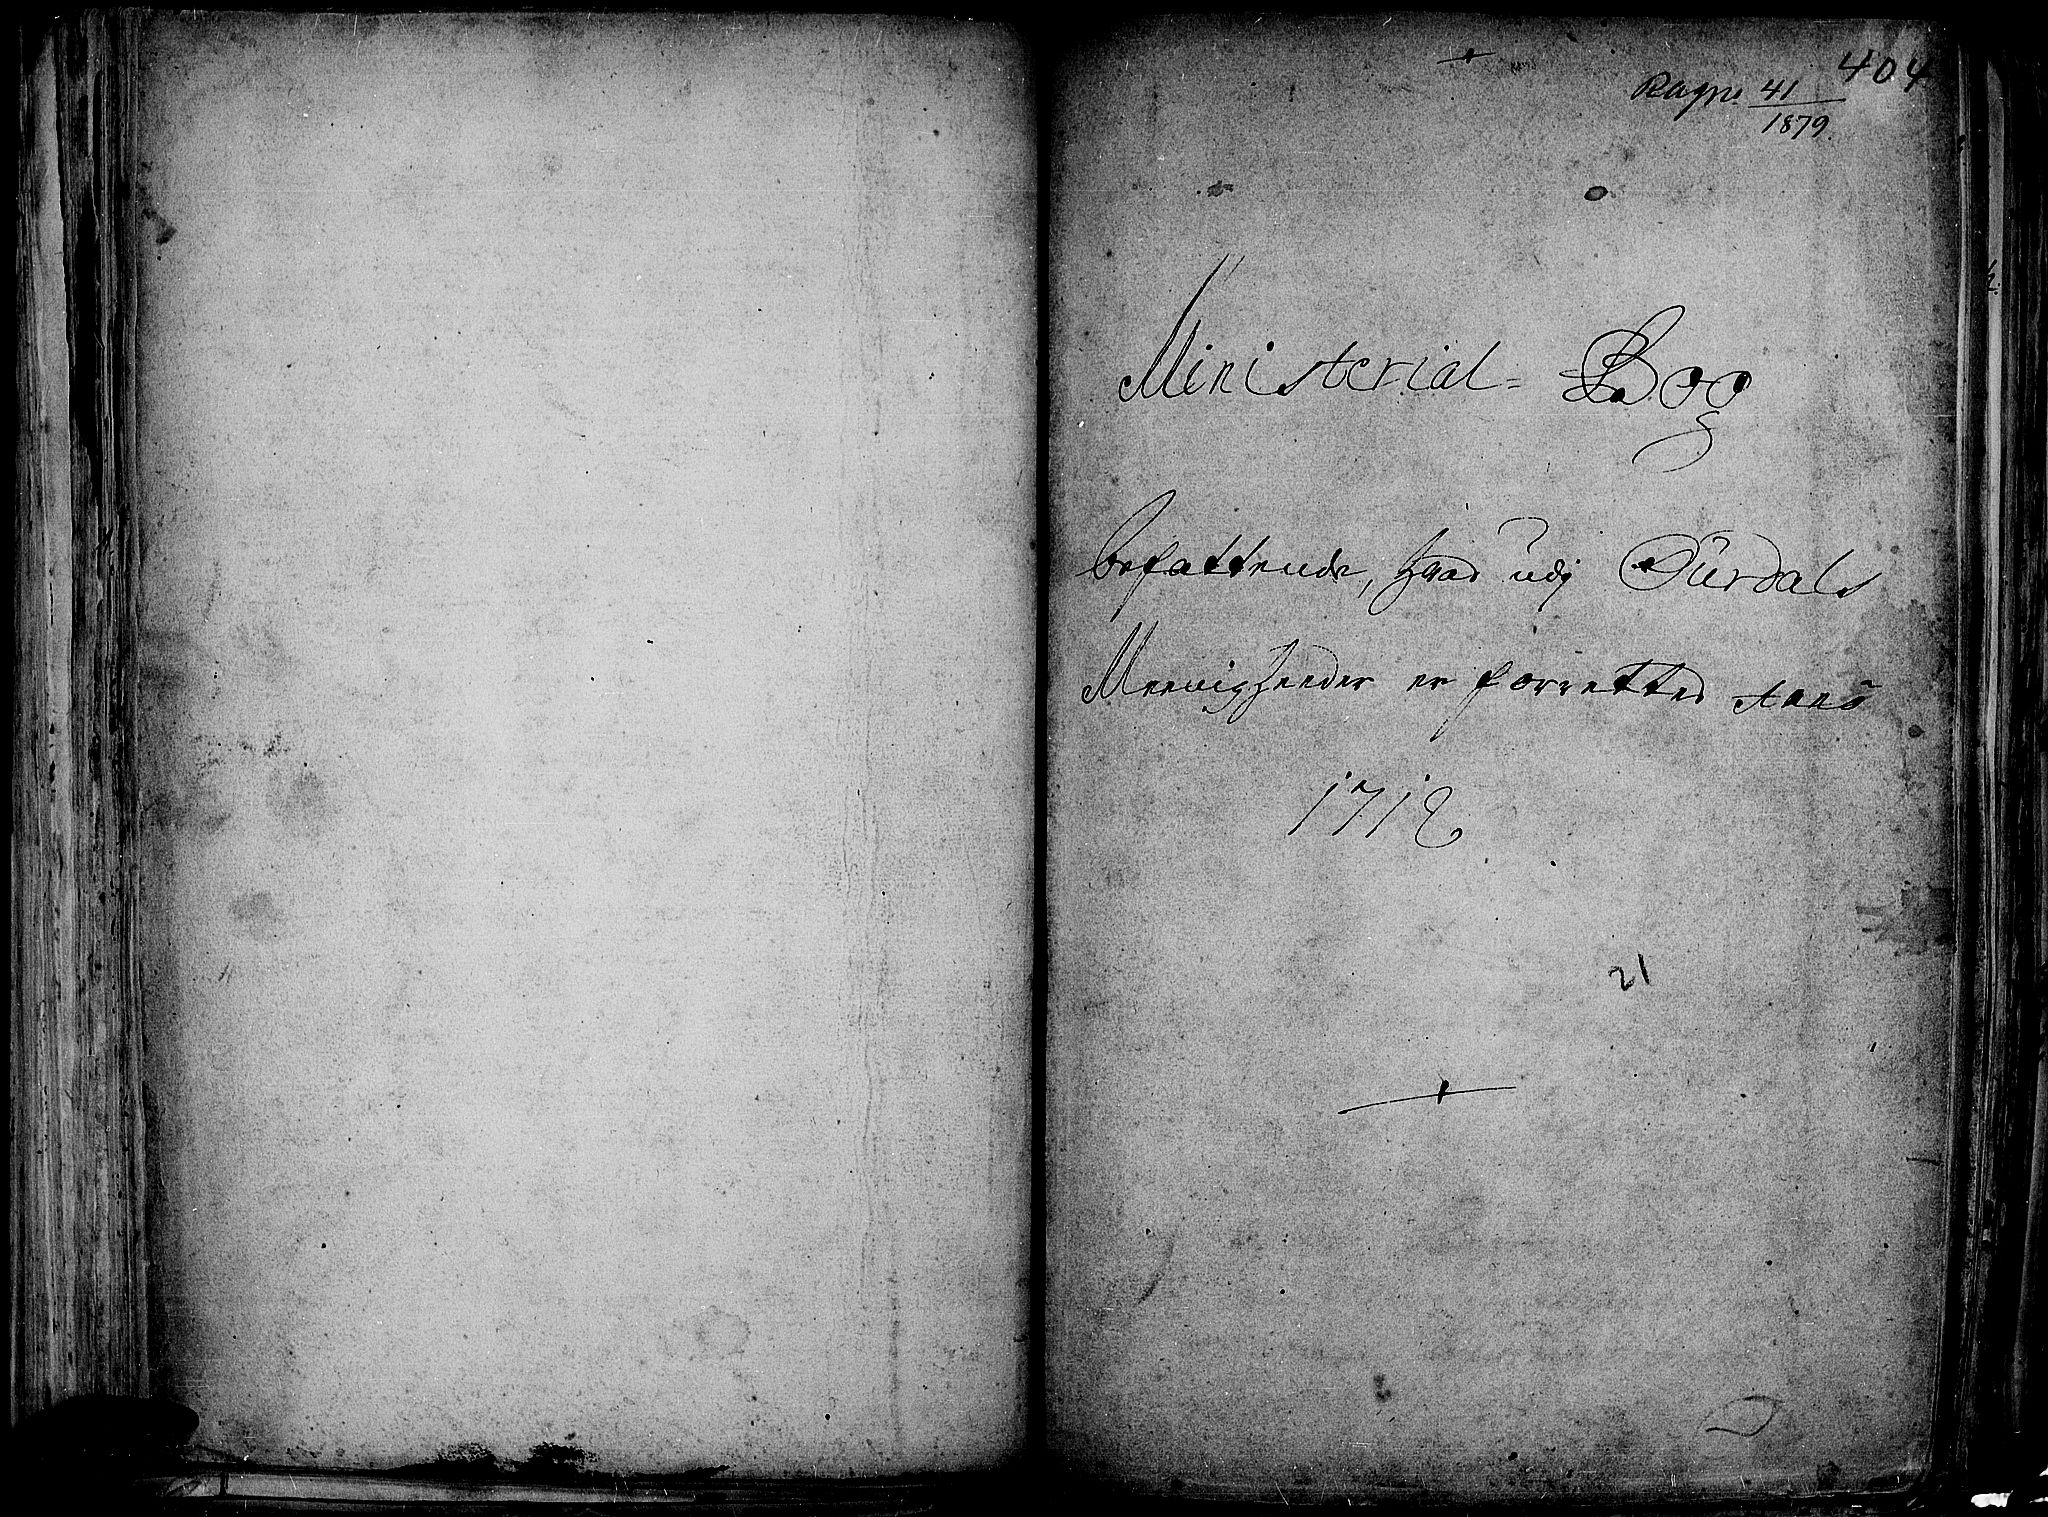 SAH, Aurdal prestekontor, Ministerialbok nr. 1-3, 1692-1730, s. 404